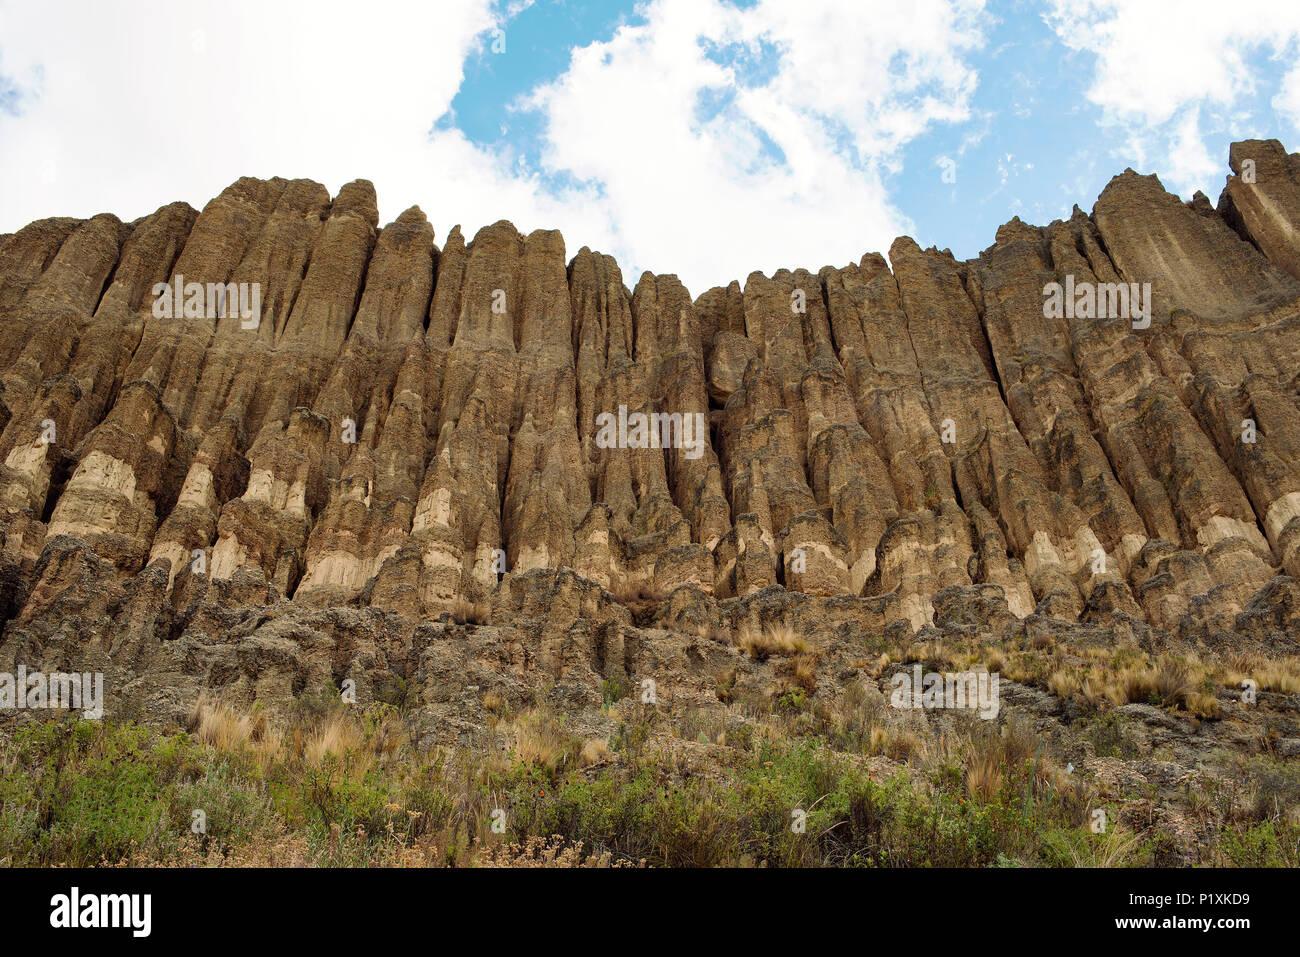 Nature designed wonderful clay works of art carved by wind erosion, rain, sun, etc. Valle de las Animas (La Paz); Bolivia. - Stock Image